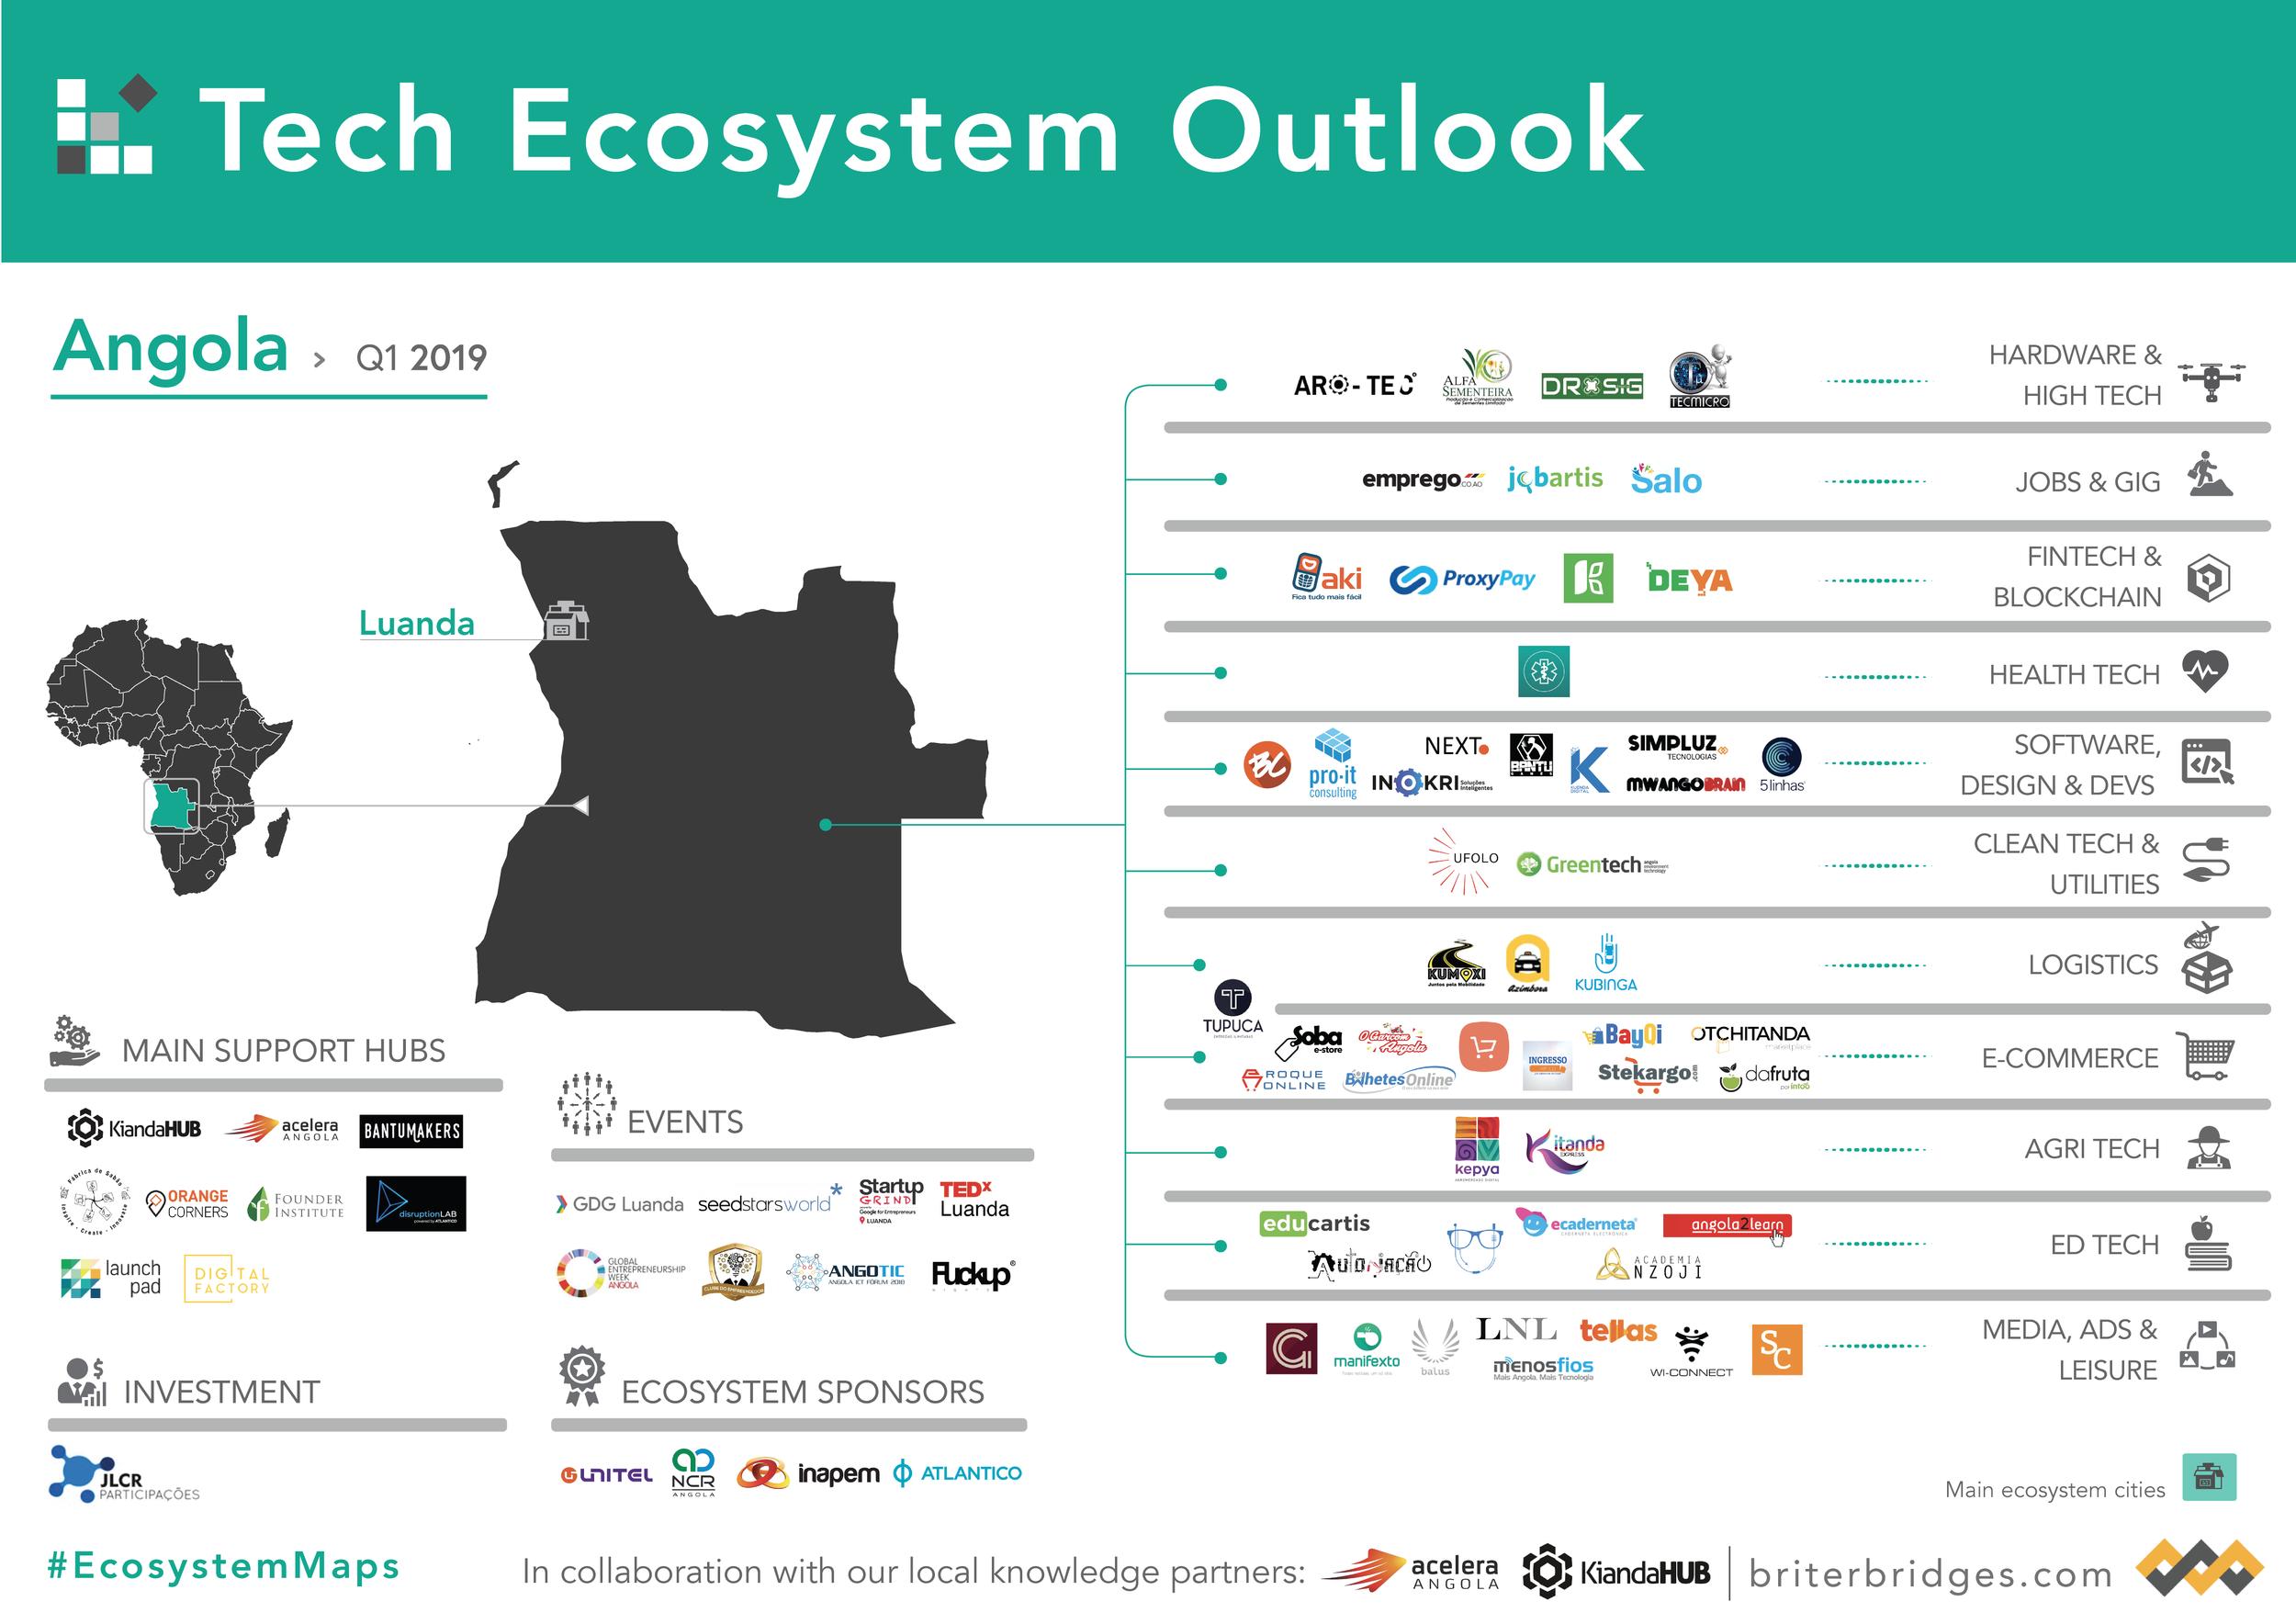 Angola's Tech Ecosystem Map